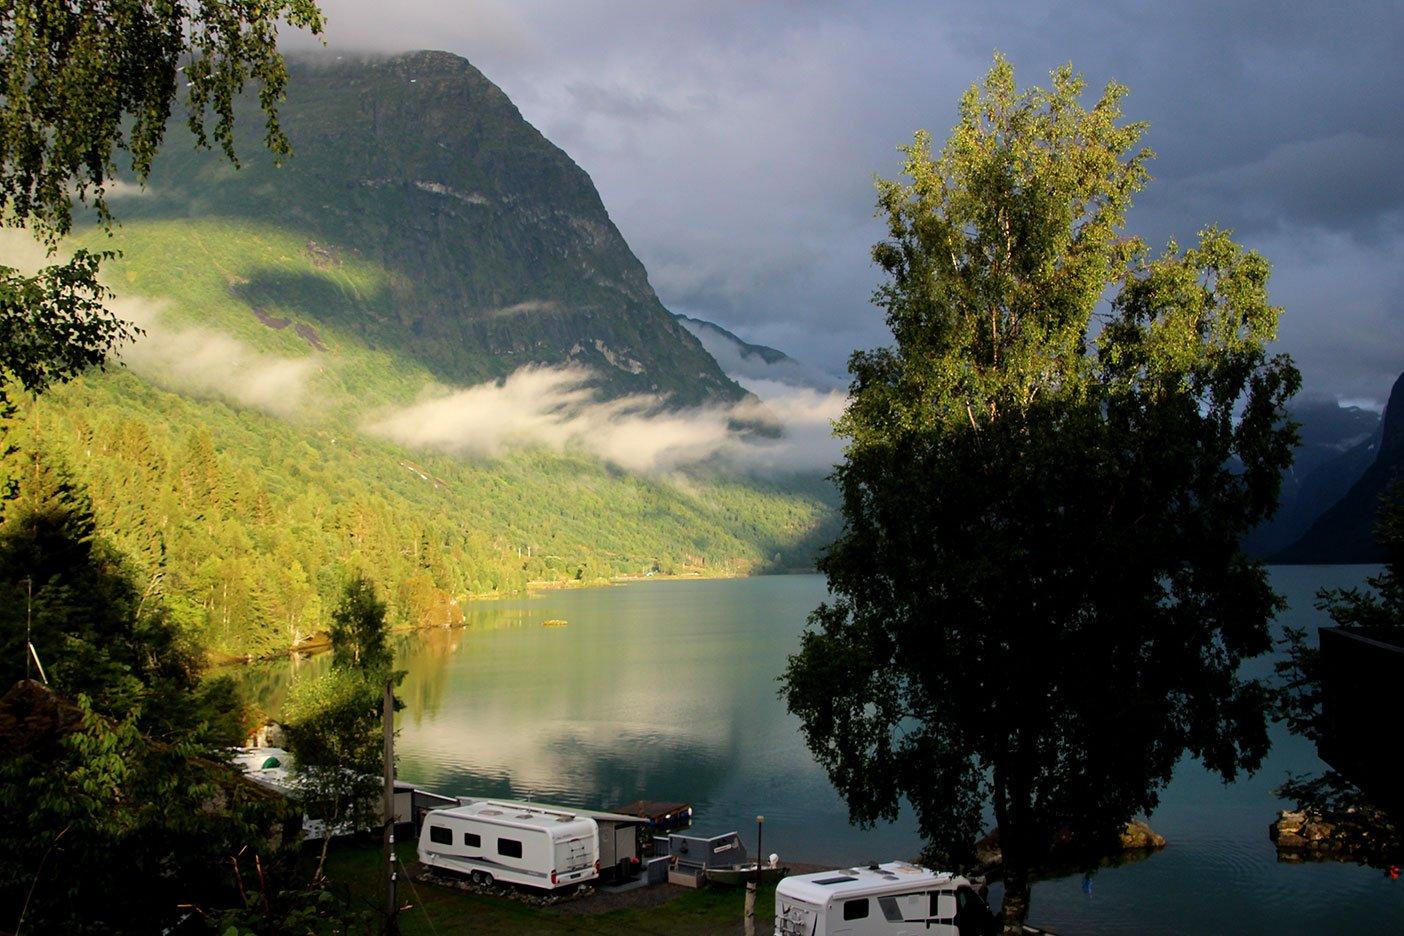 Camping-Tipps für Anfänger Campingplatzwahl